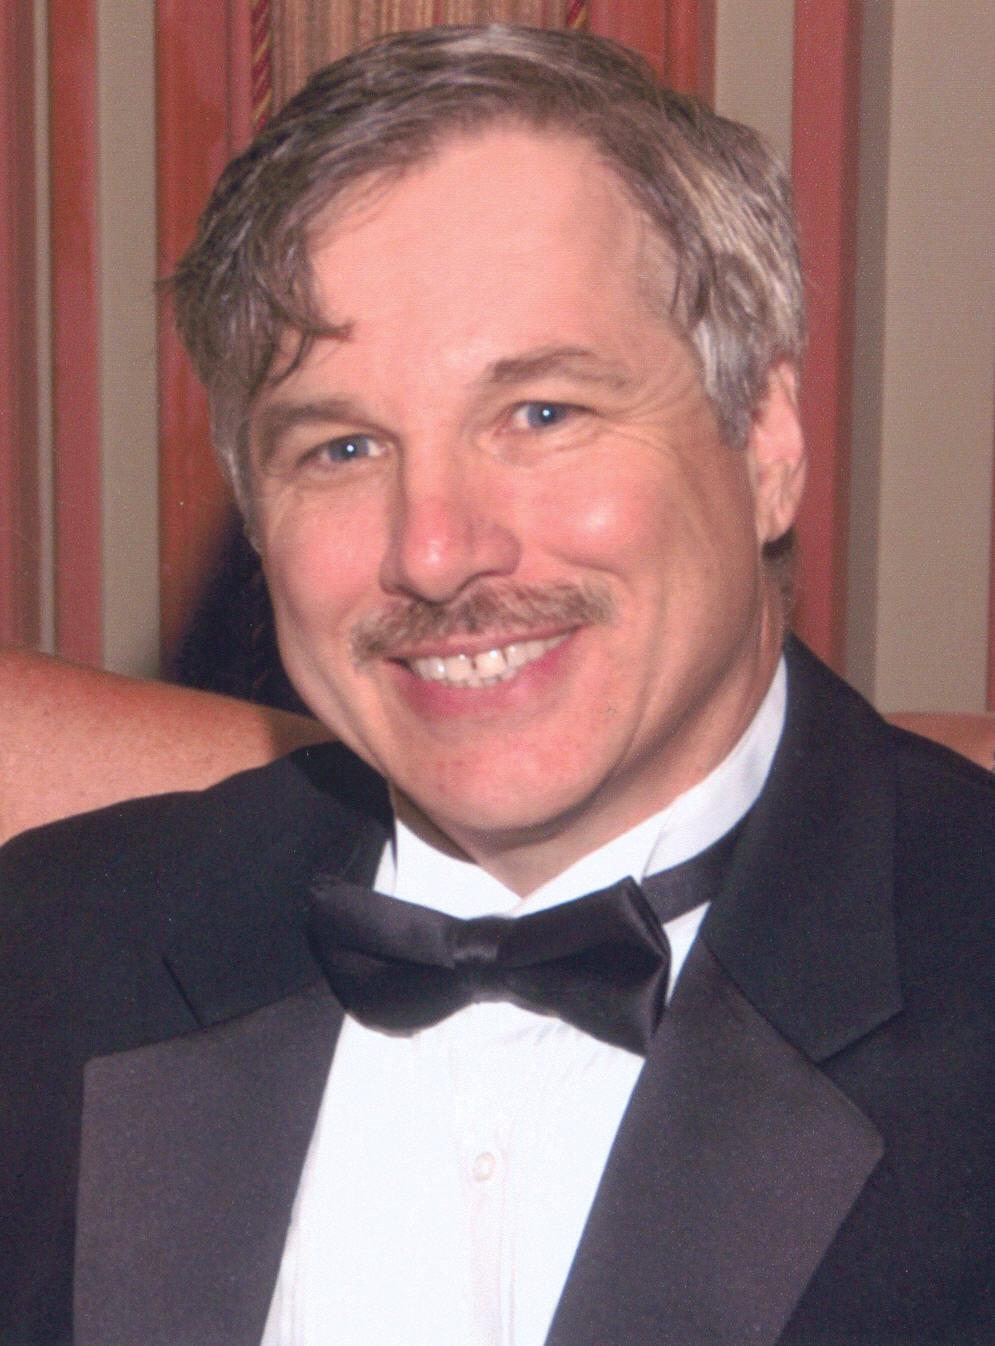 Marc Hamburg, President